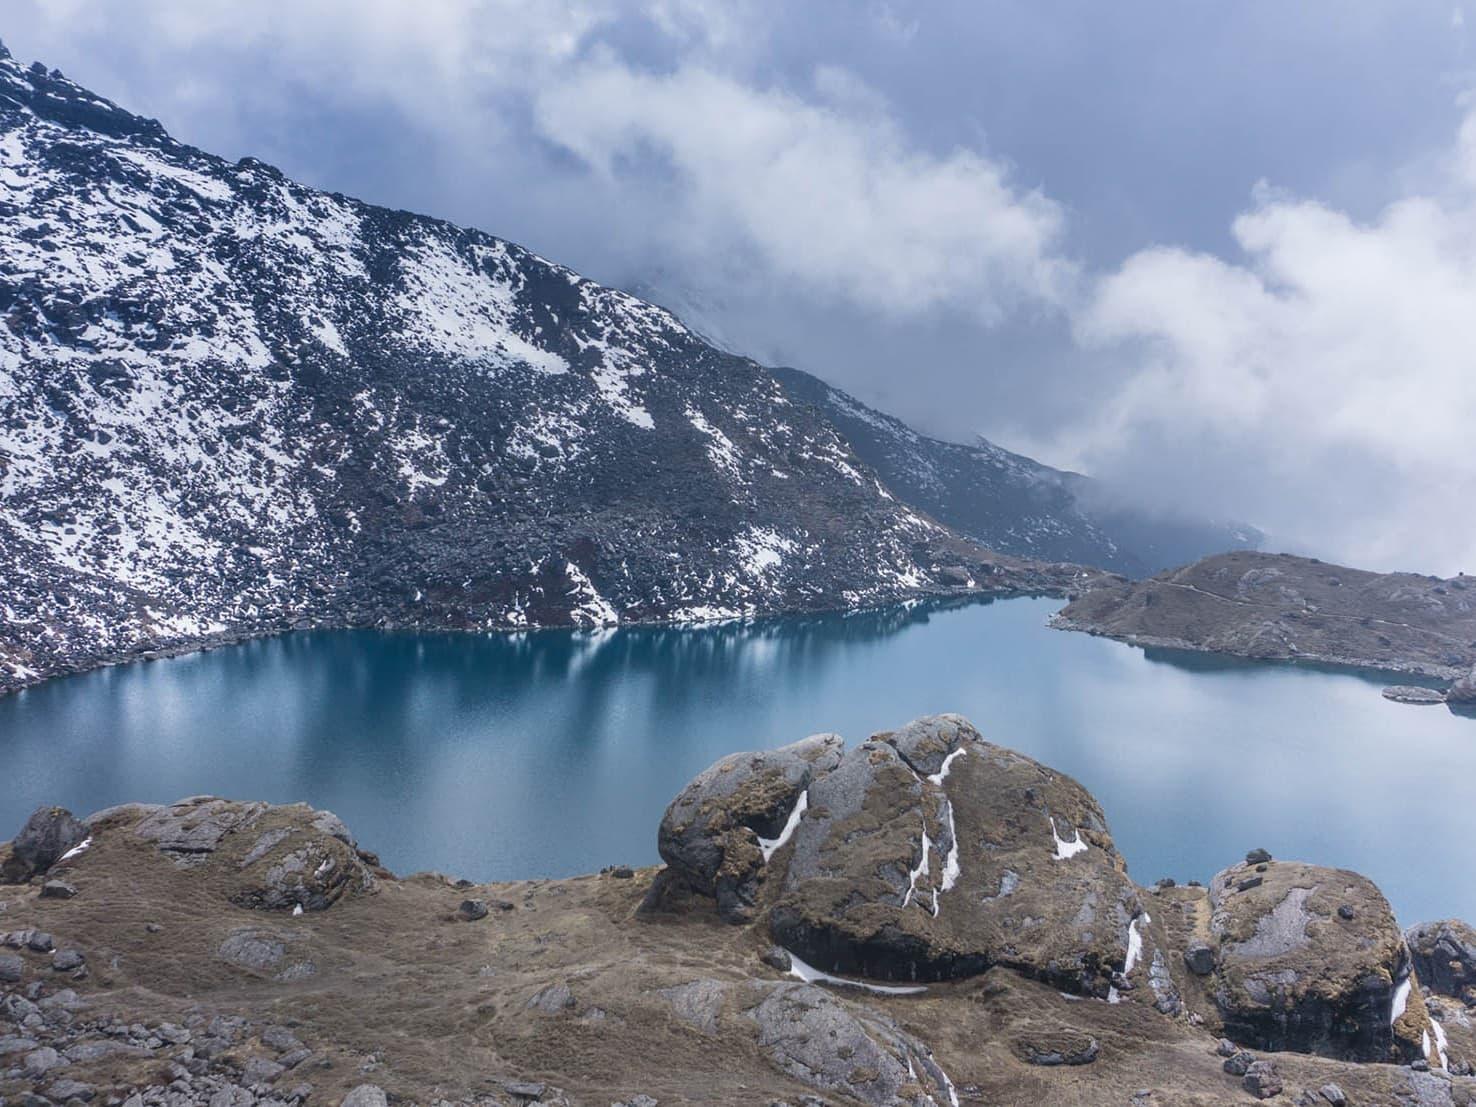 El lago sagrado Gosaikunda de langtang